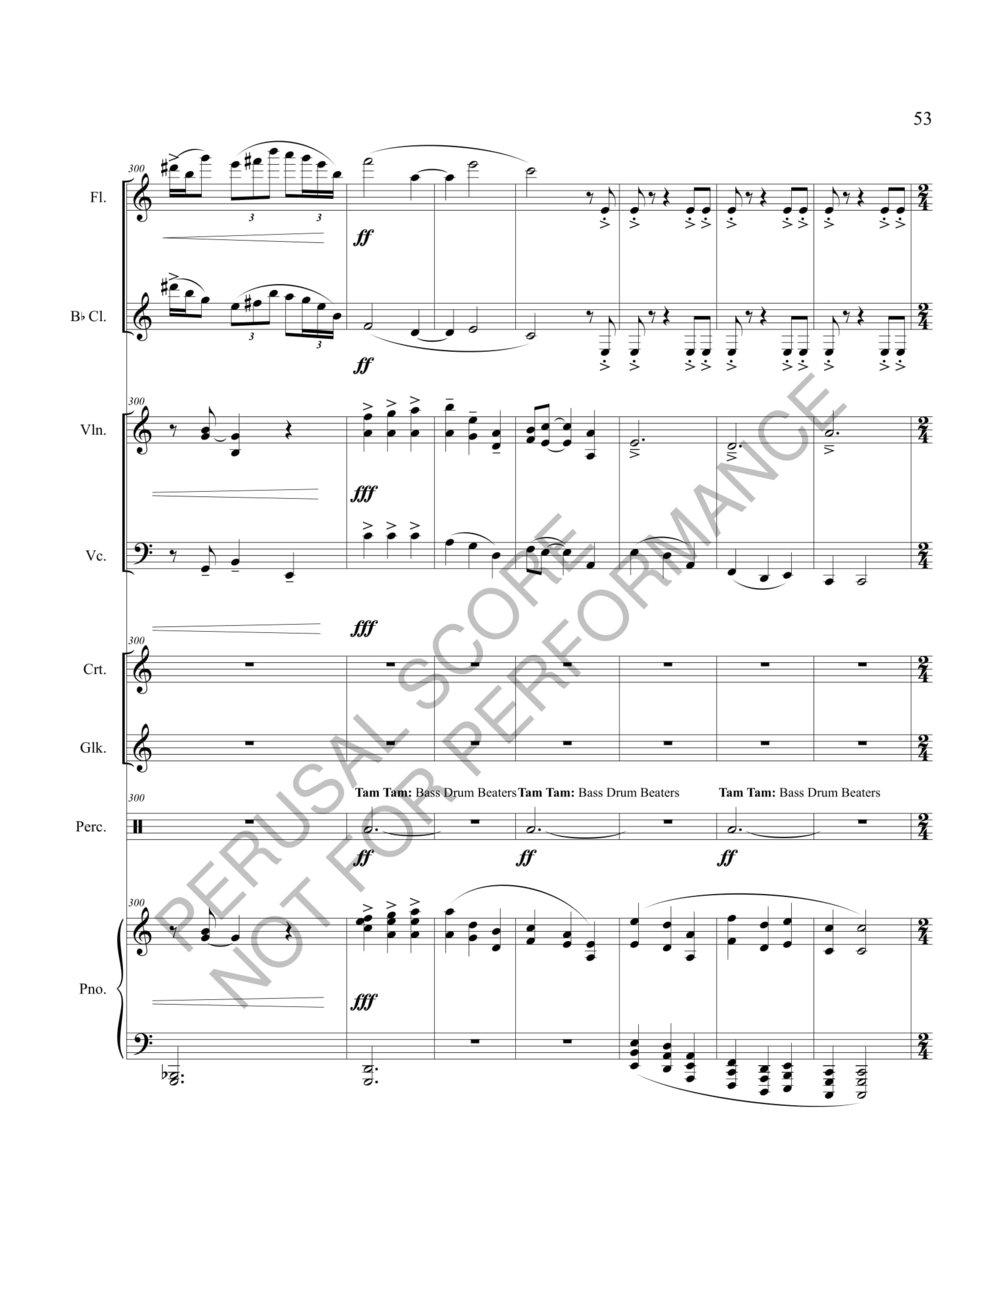 Boyd Terra Liberi Score-watermark-59.jpg